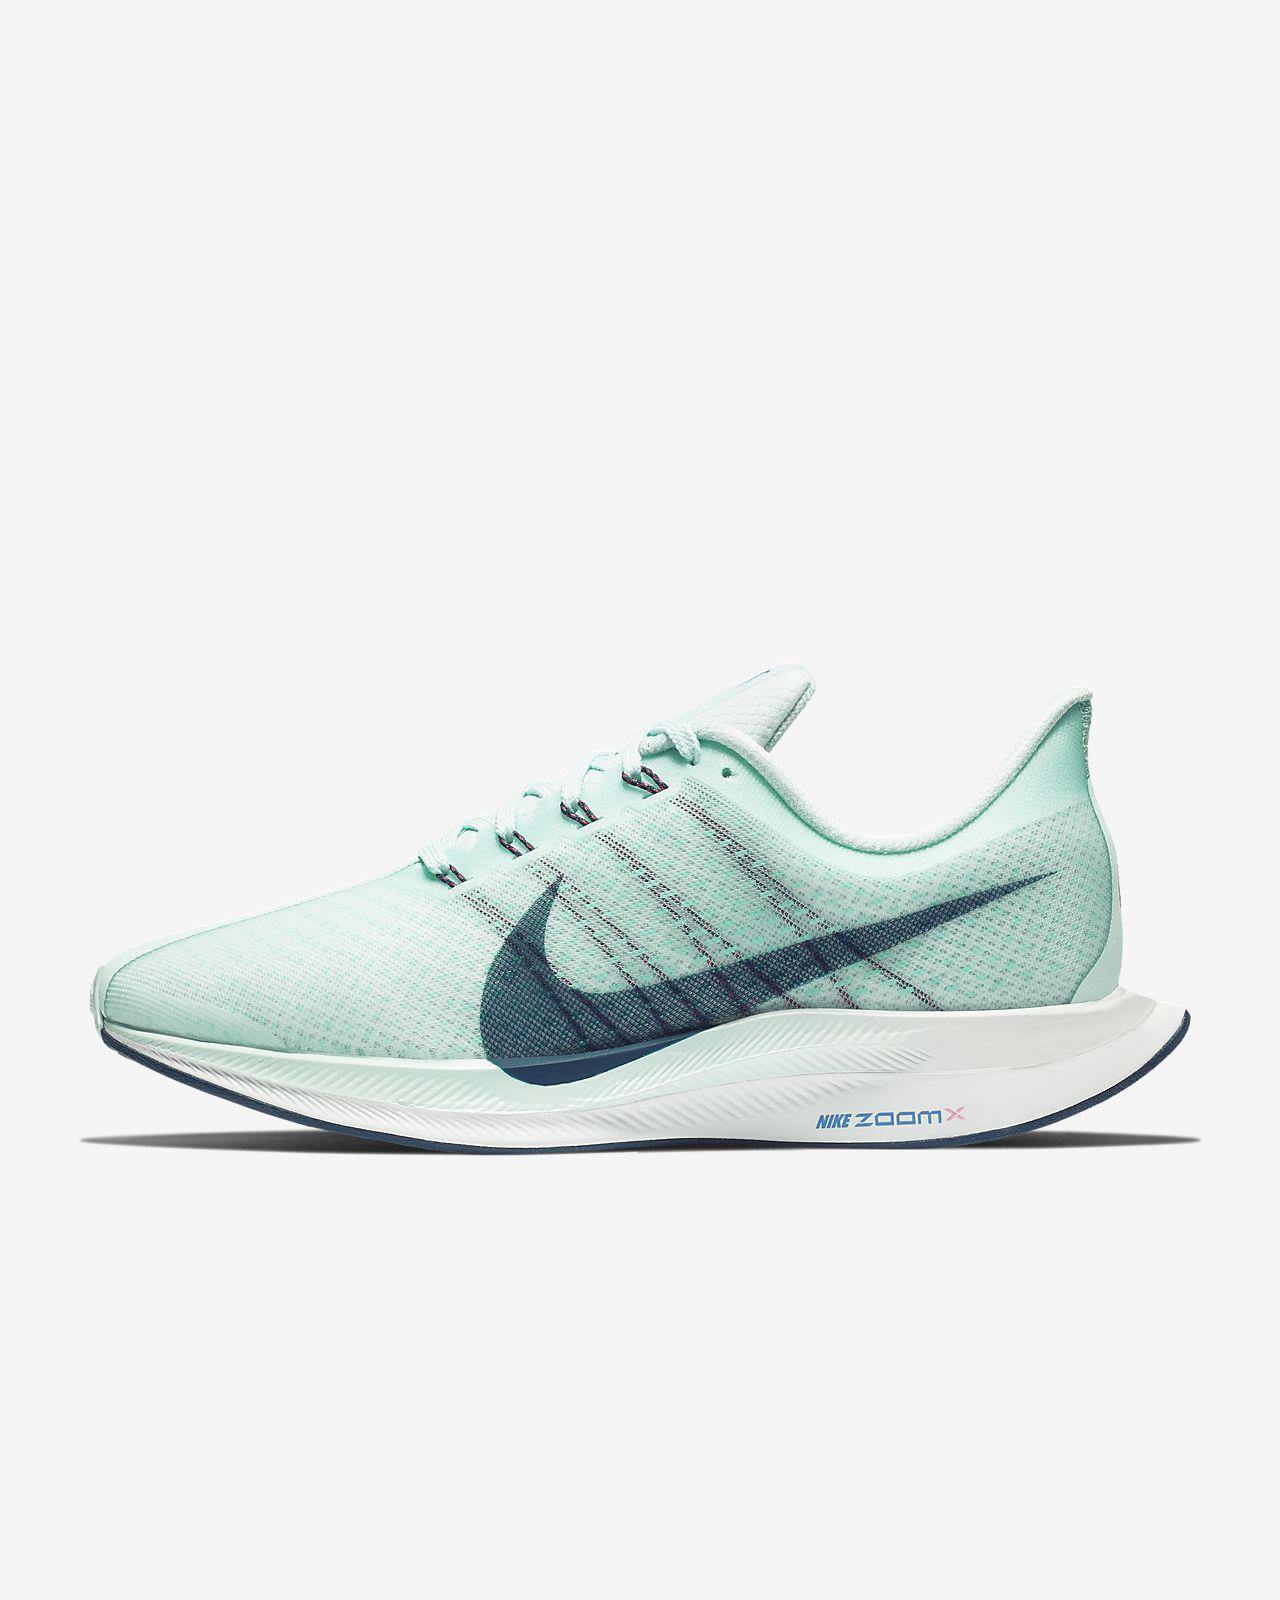 detailed look b0c4c 04c47 Chaussure de running Nike Zoom Pegasus Turbo pour Femme. Nike.com BE